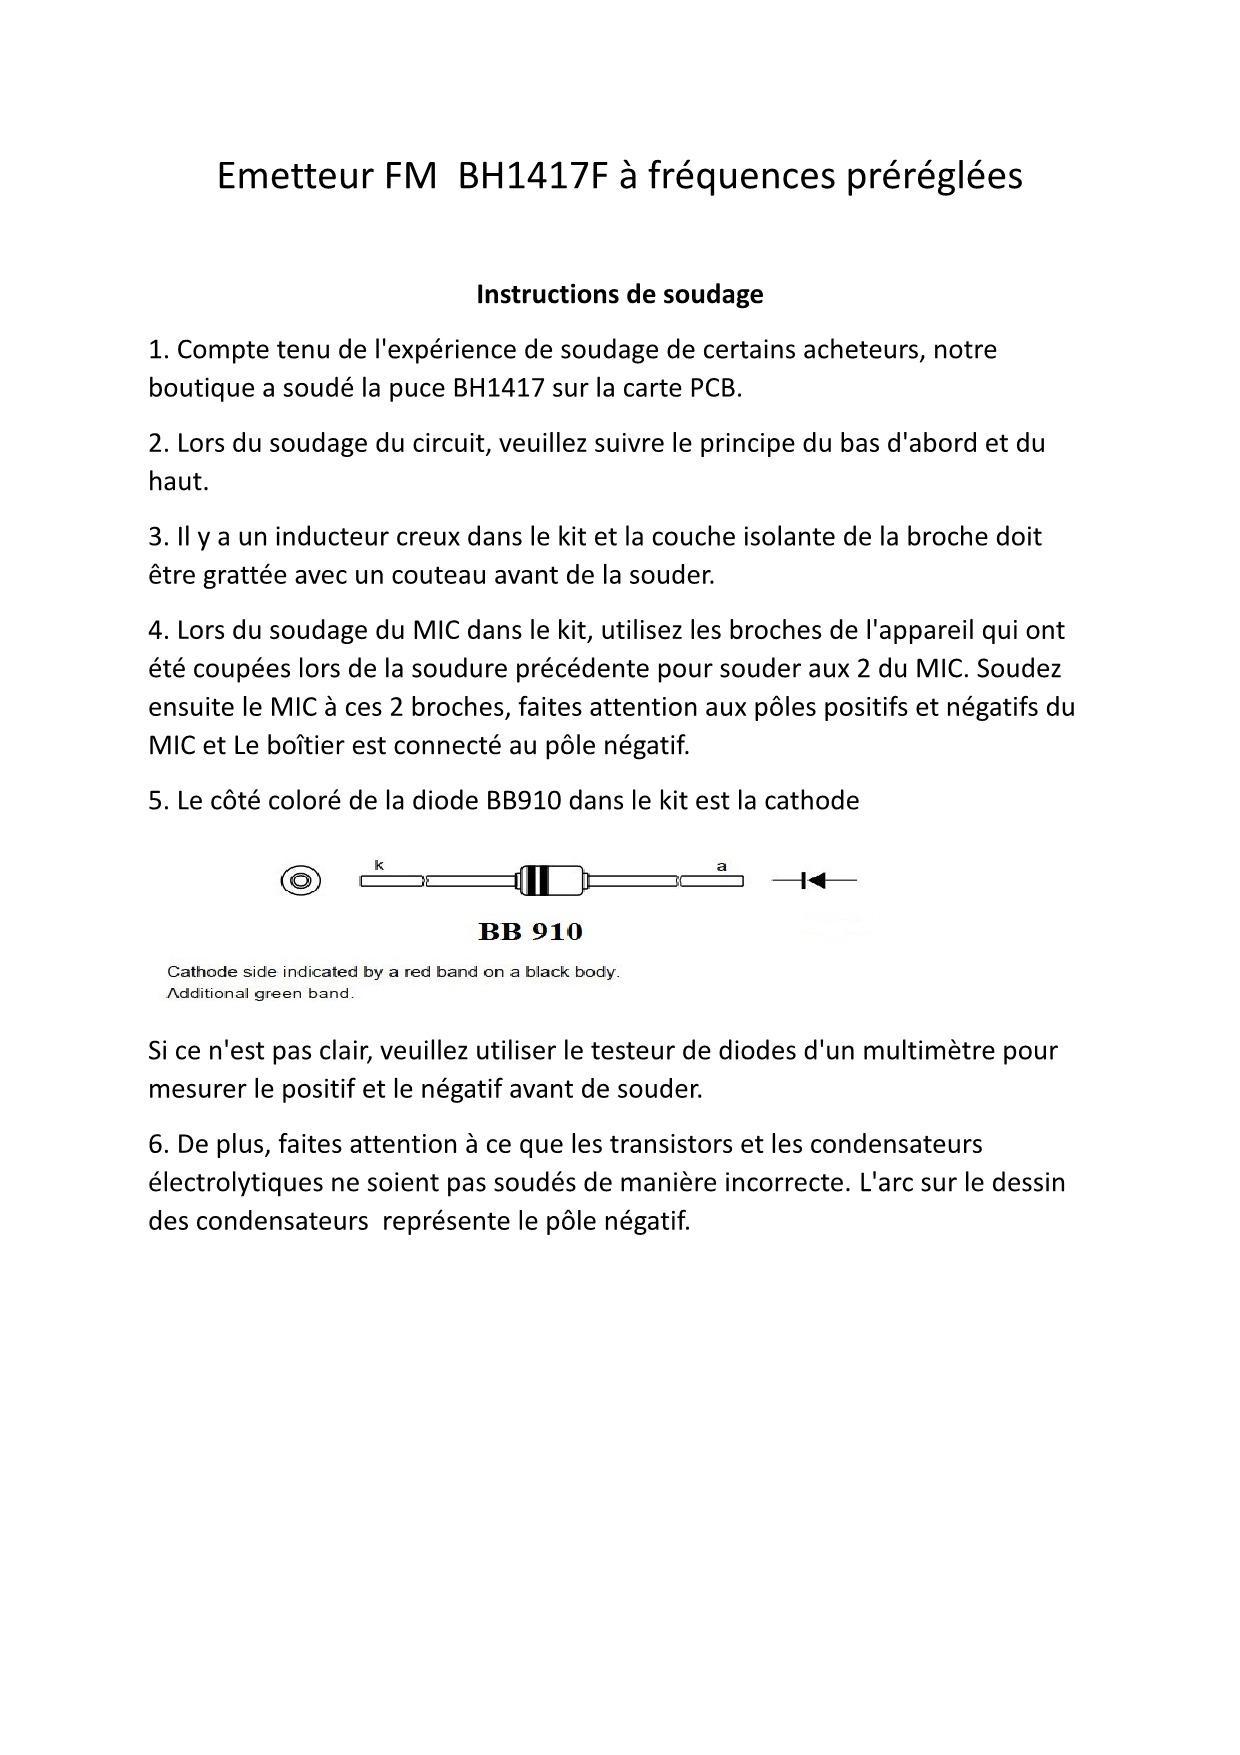 Emetteur fm bh1417f a frequences prereglees 1